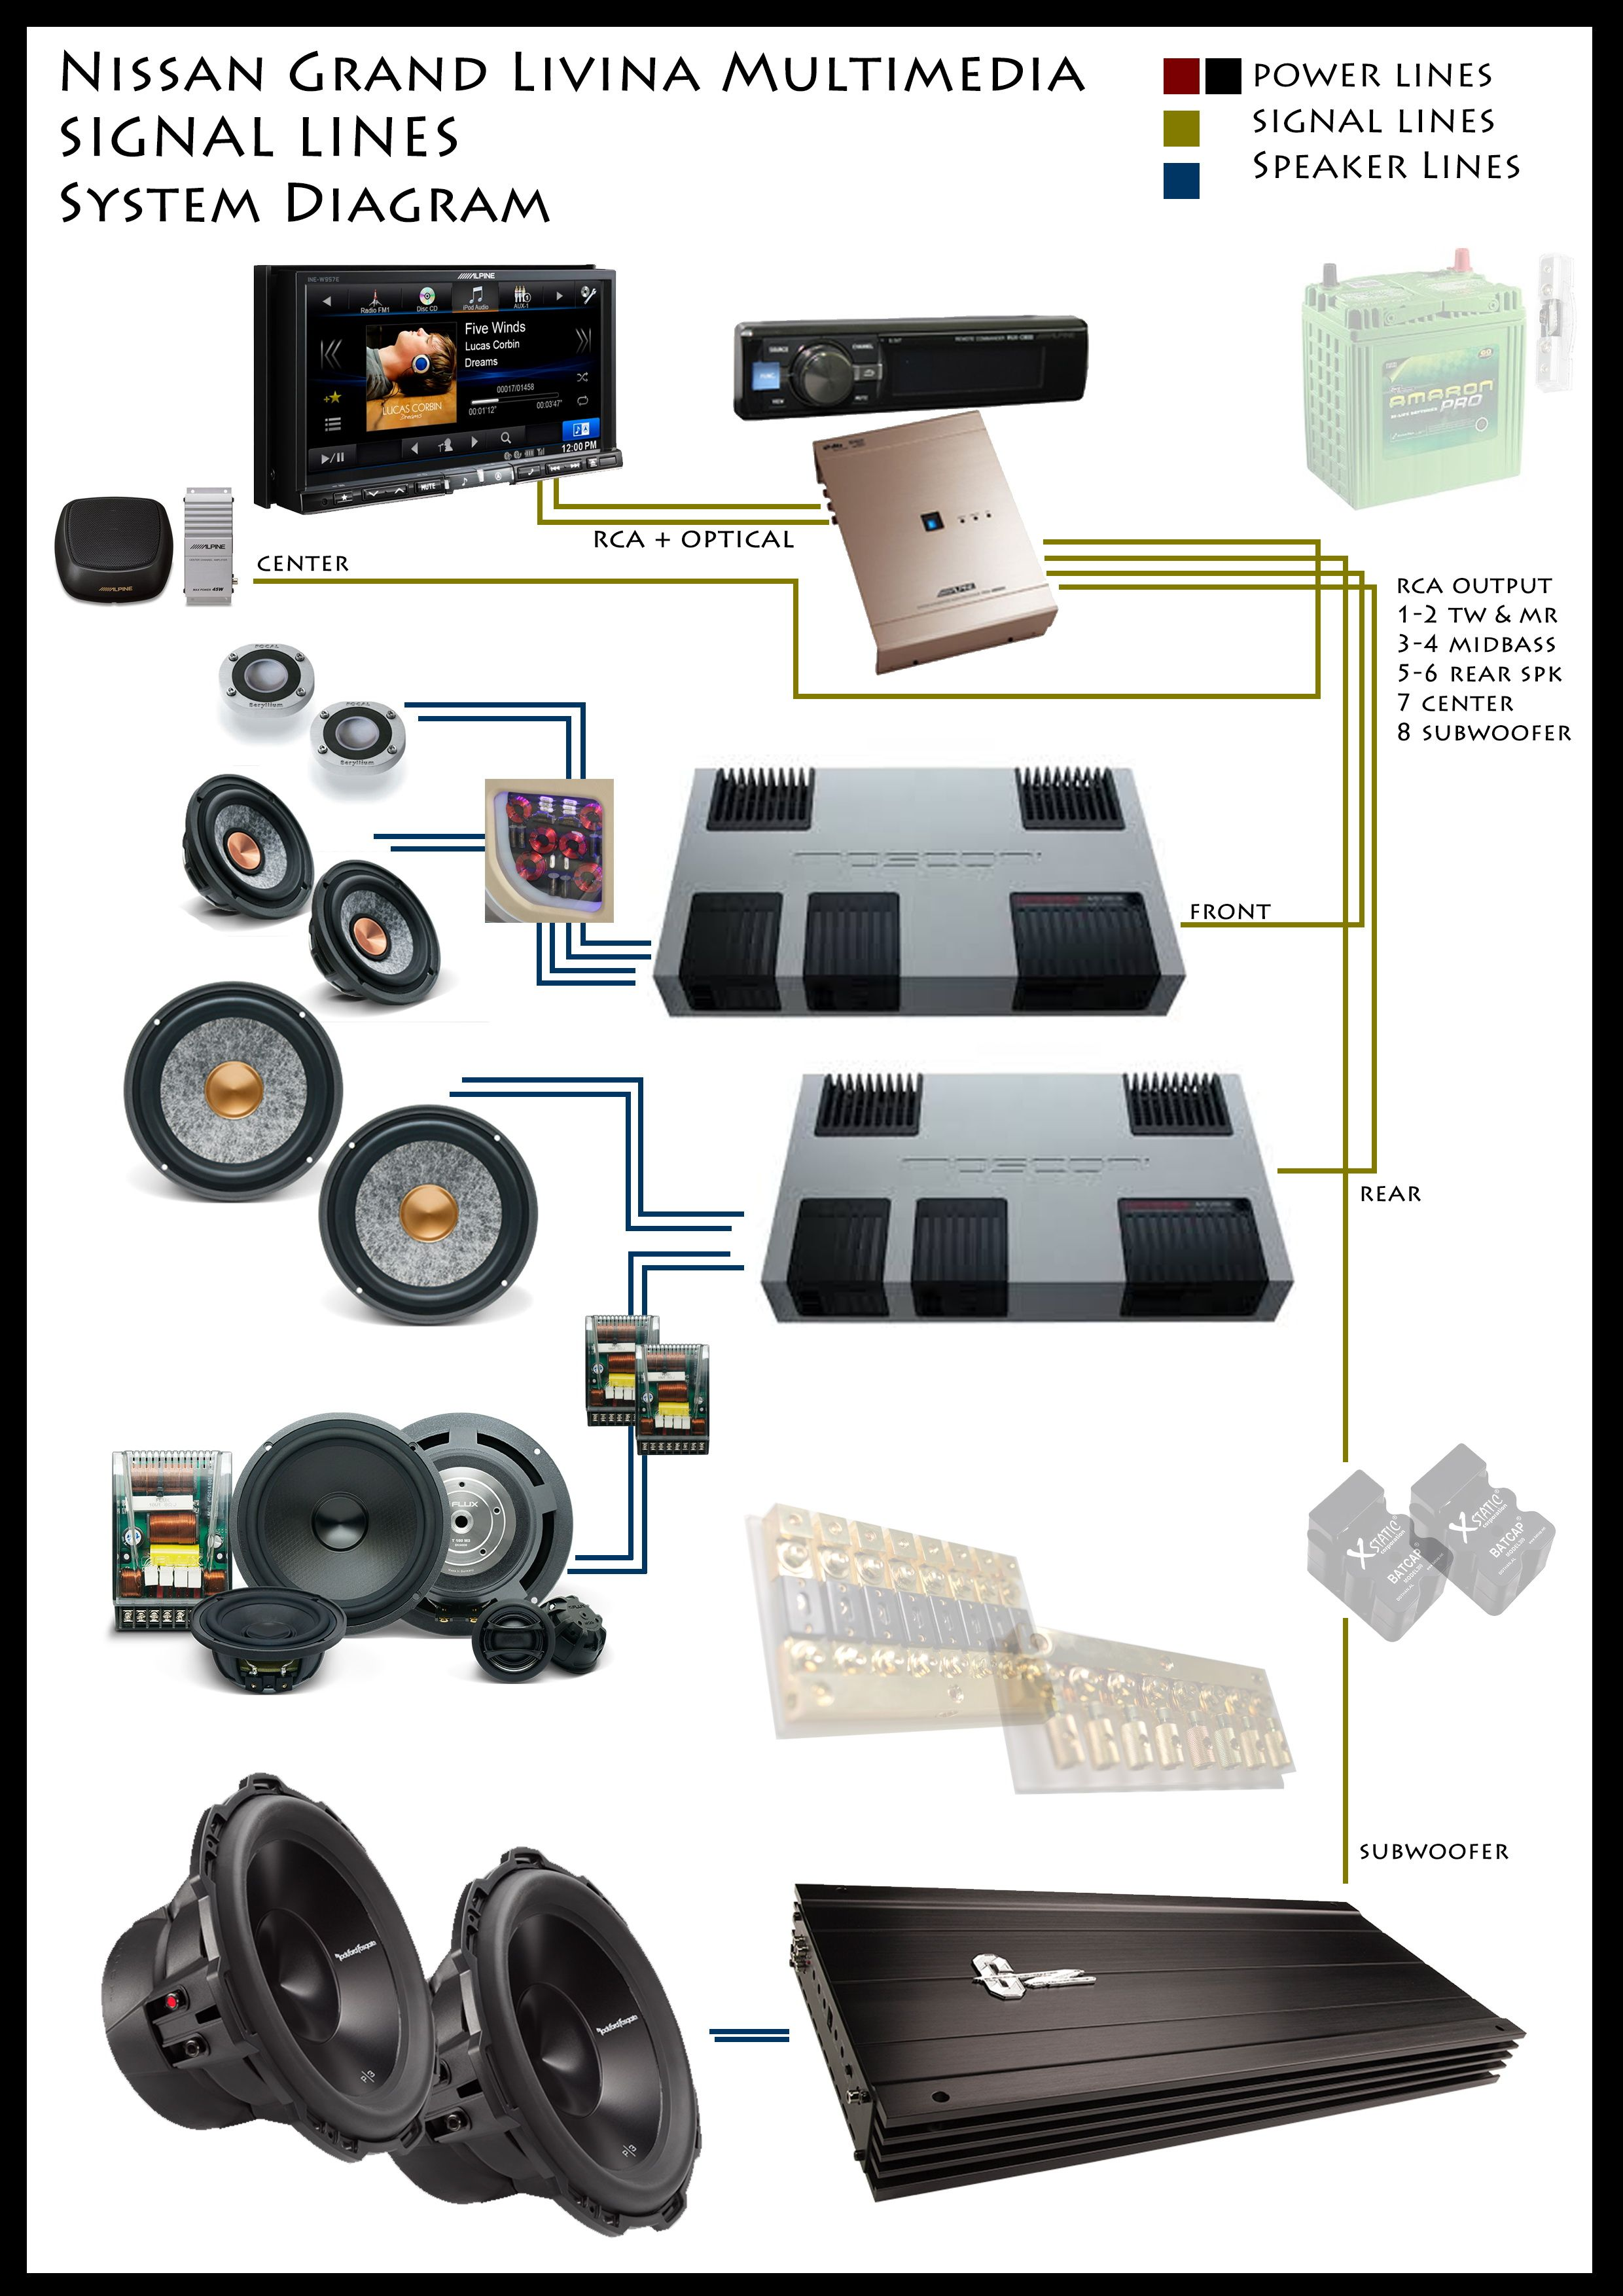 hight resolution of nissan grand livina emma champions multimedia 5 1 class by www cartens audio com